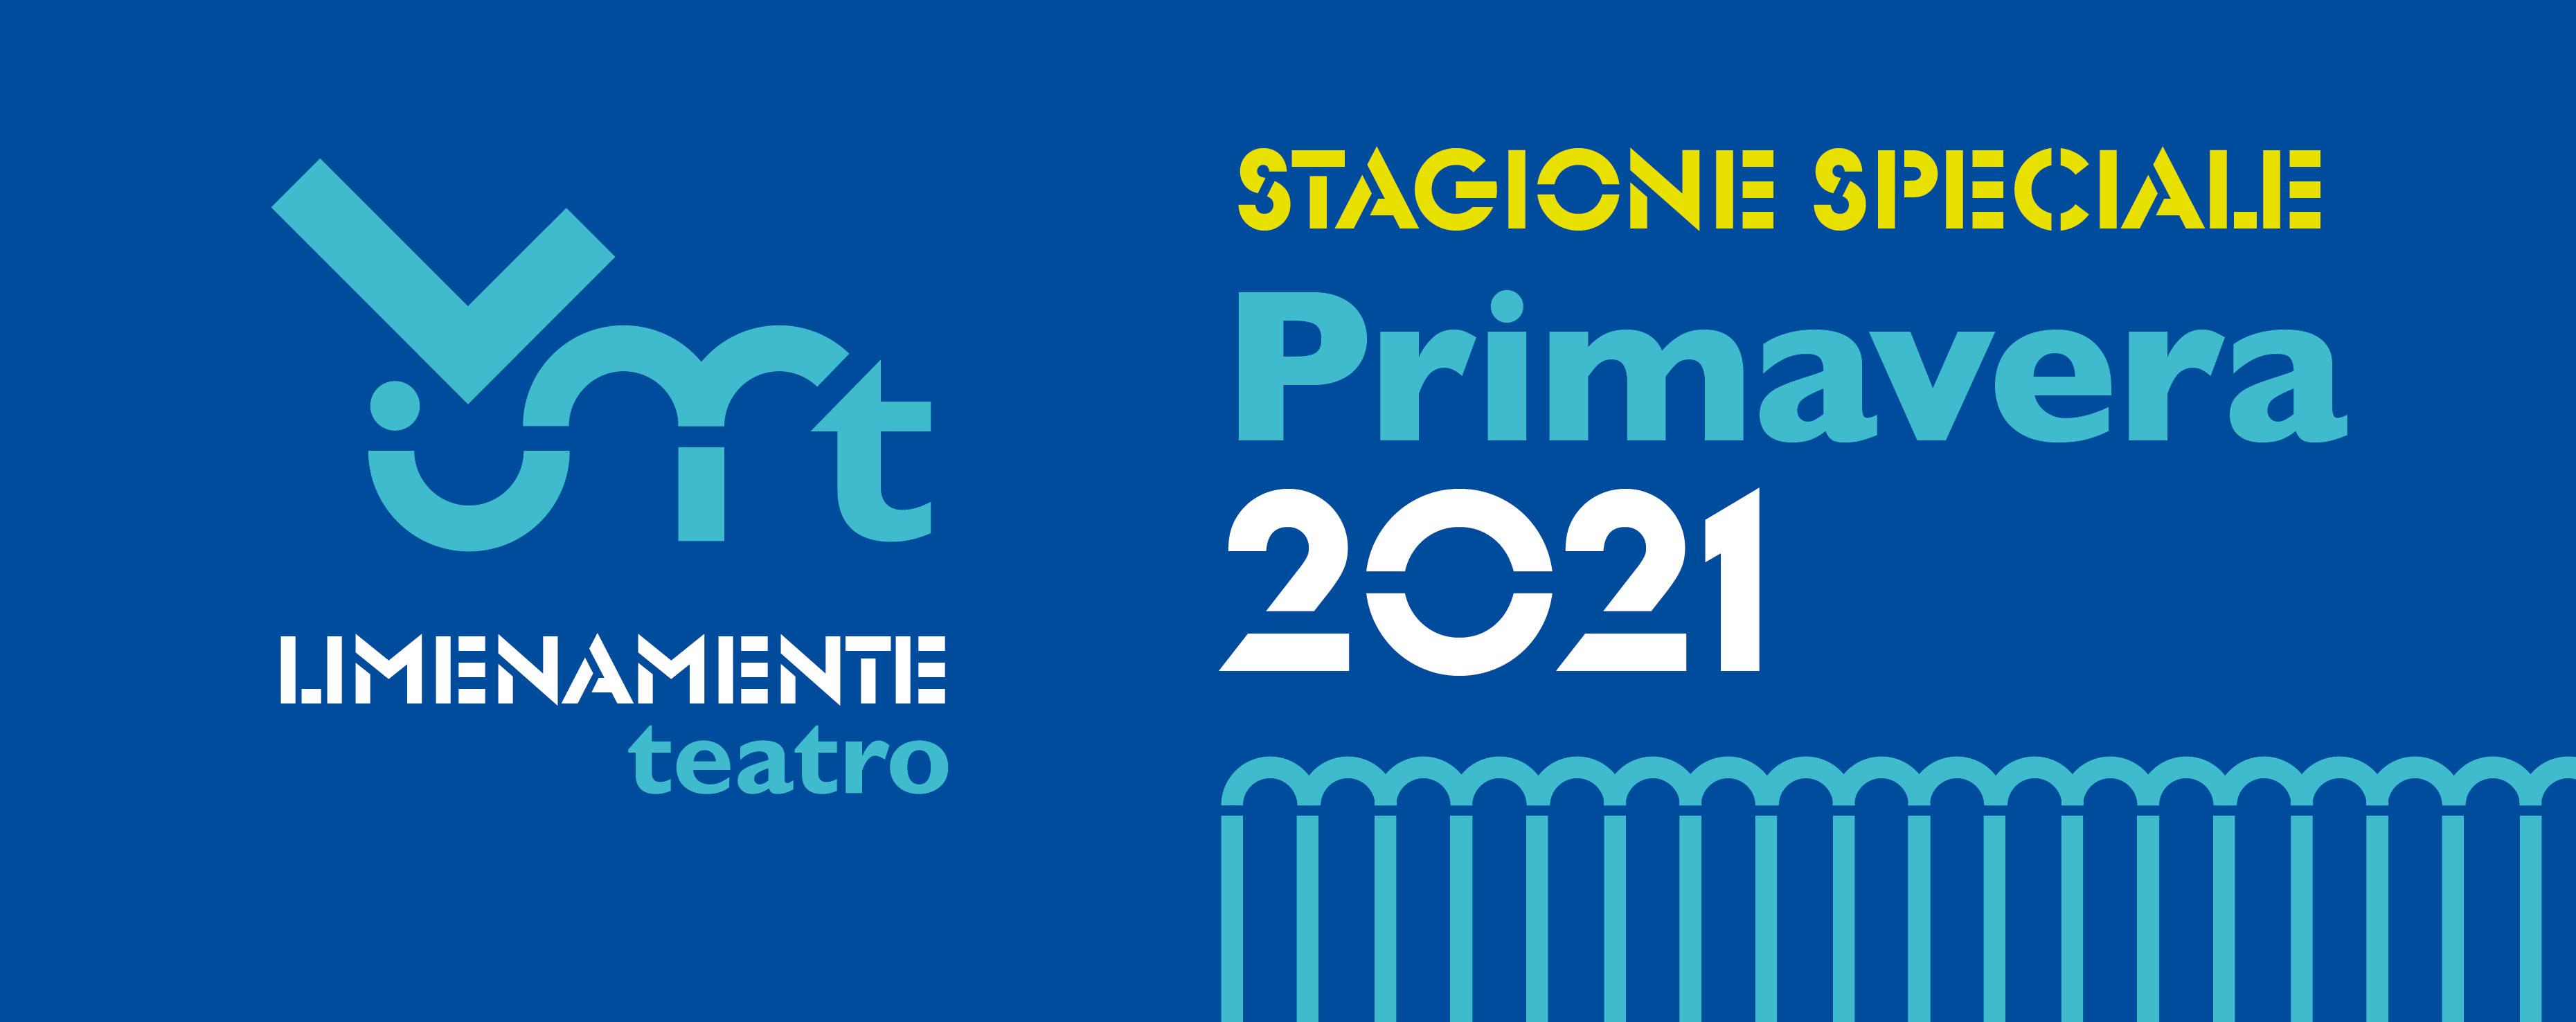 Limenamente Teatro Primavera 2021